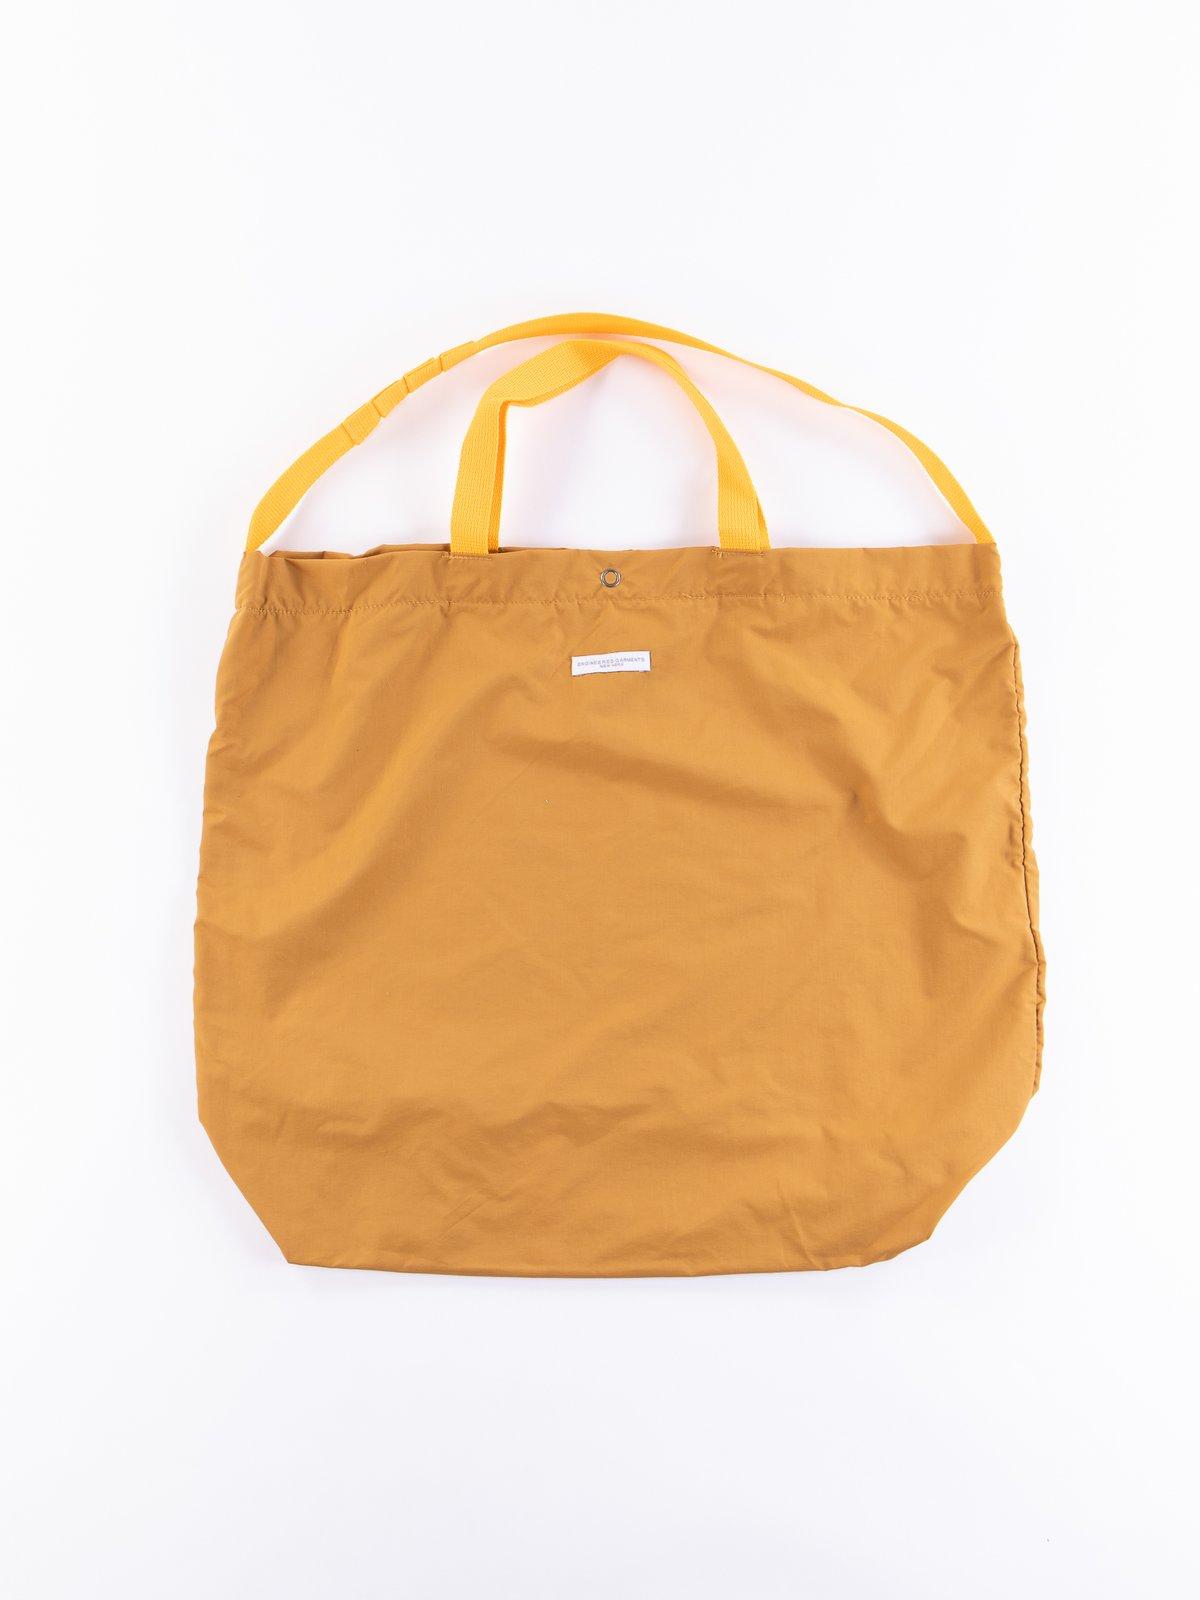 Mustard Acrylic Coated Nylon Taffeta Carry All Tote - Image 1